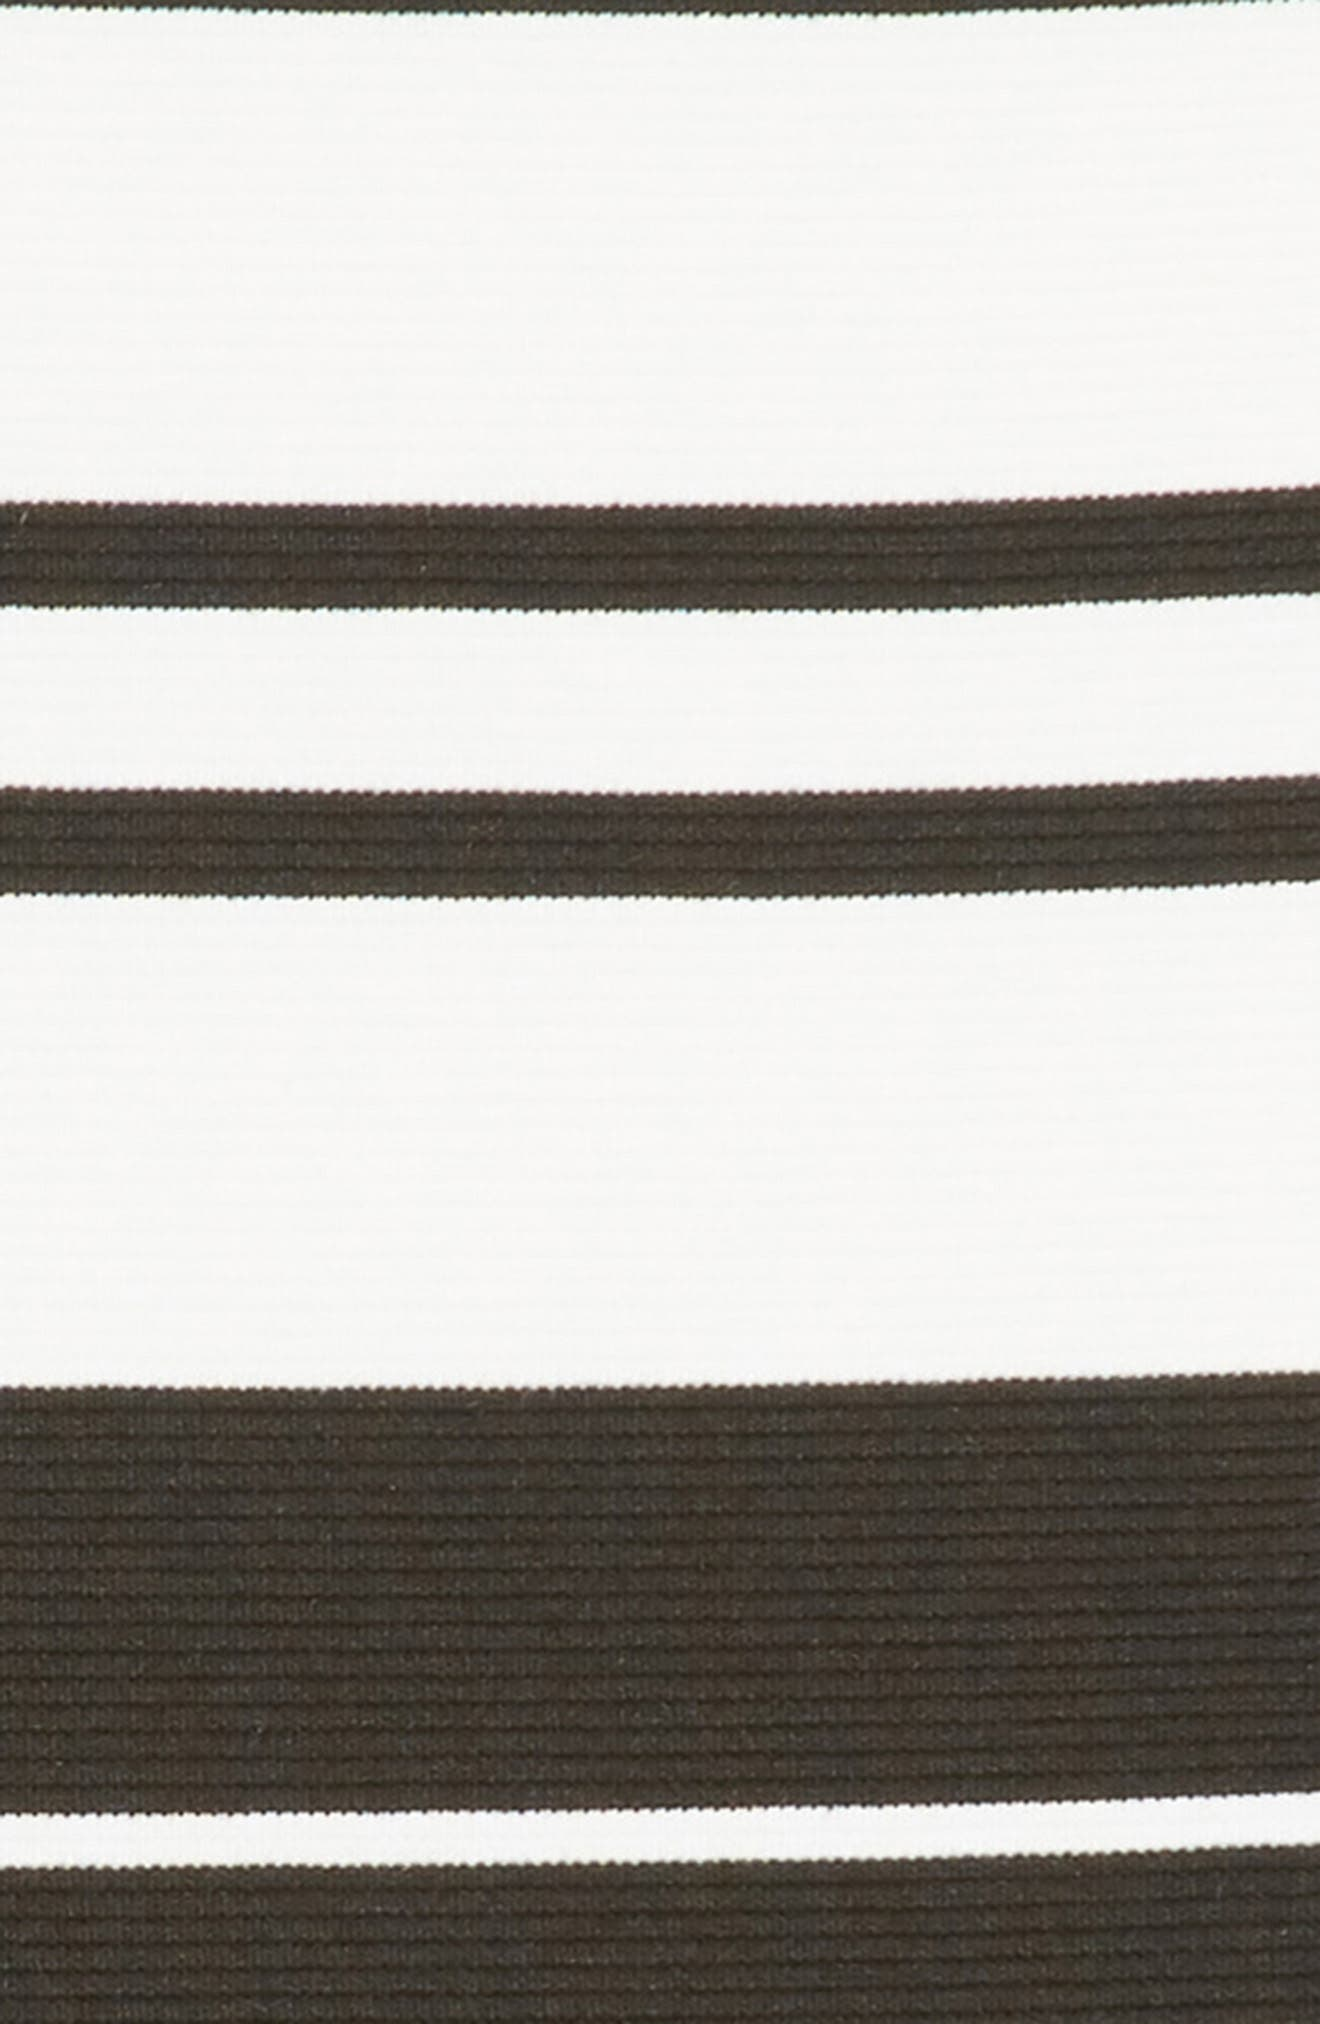 Novelty Texture Knit Dress,                             Alternate thumbnail 3, color,                             100